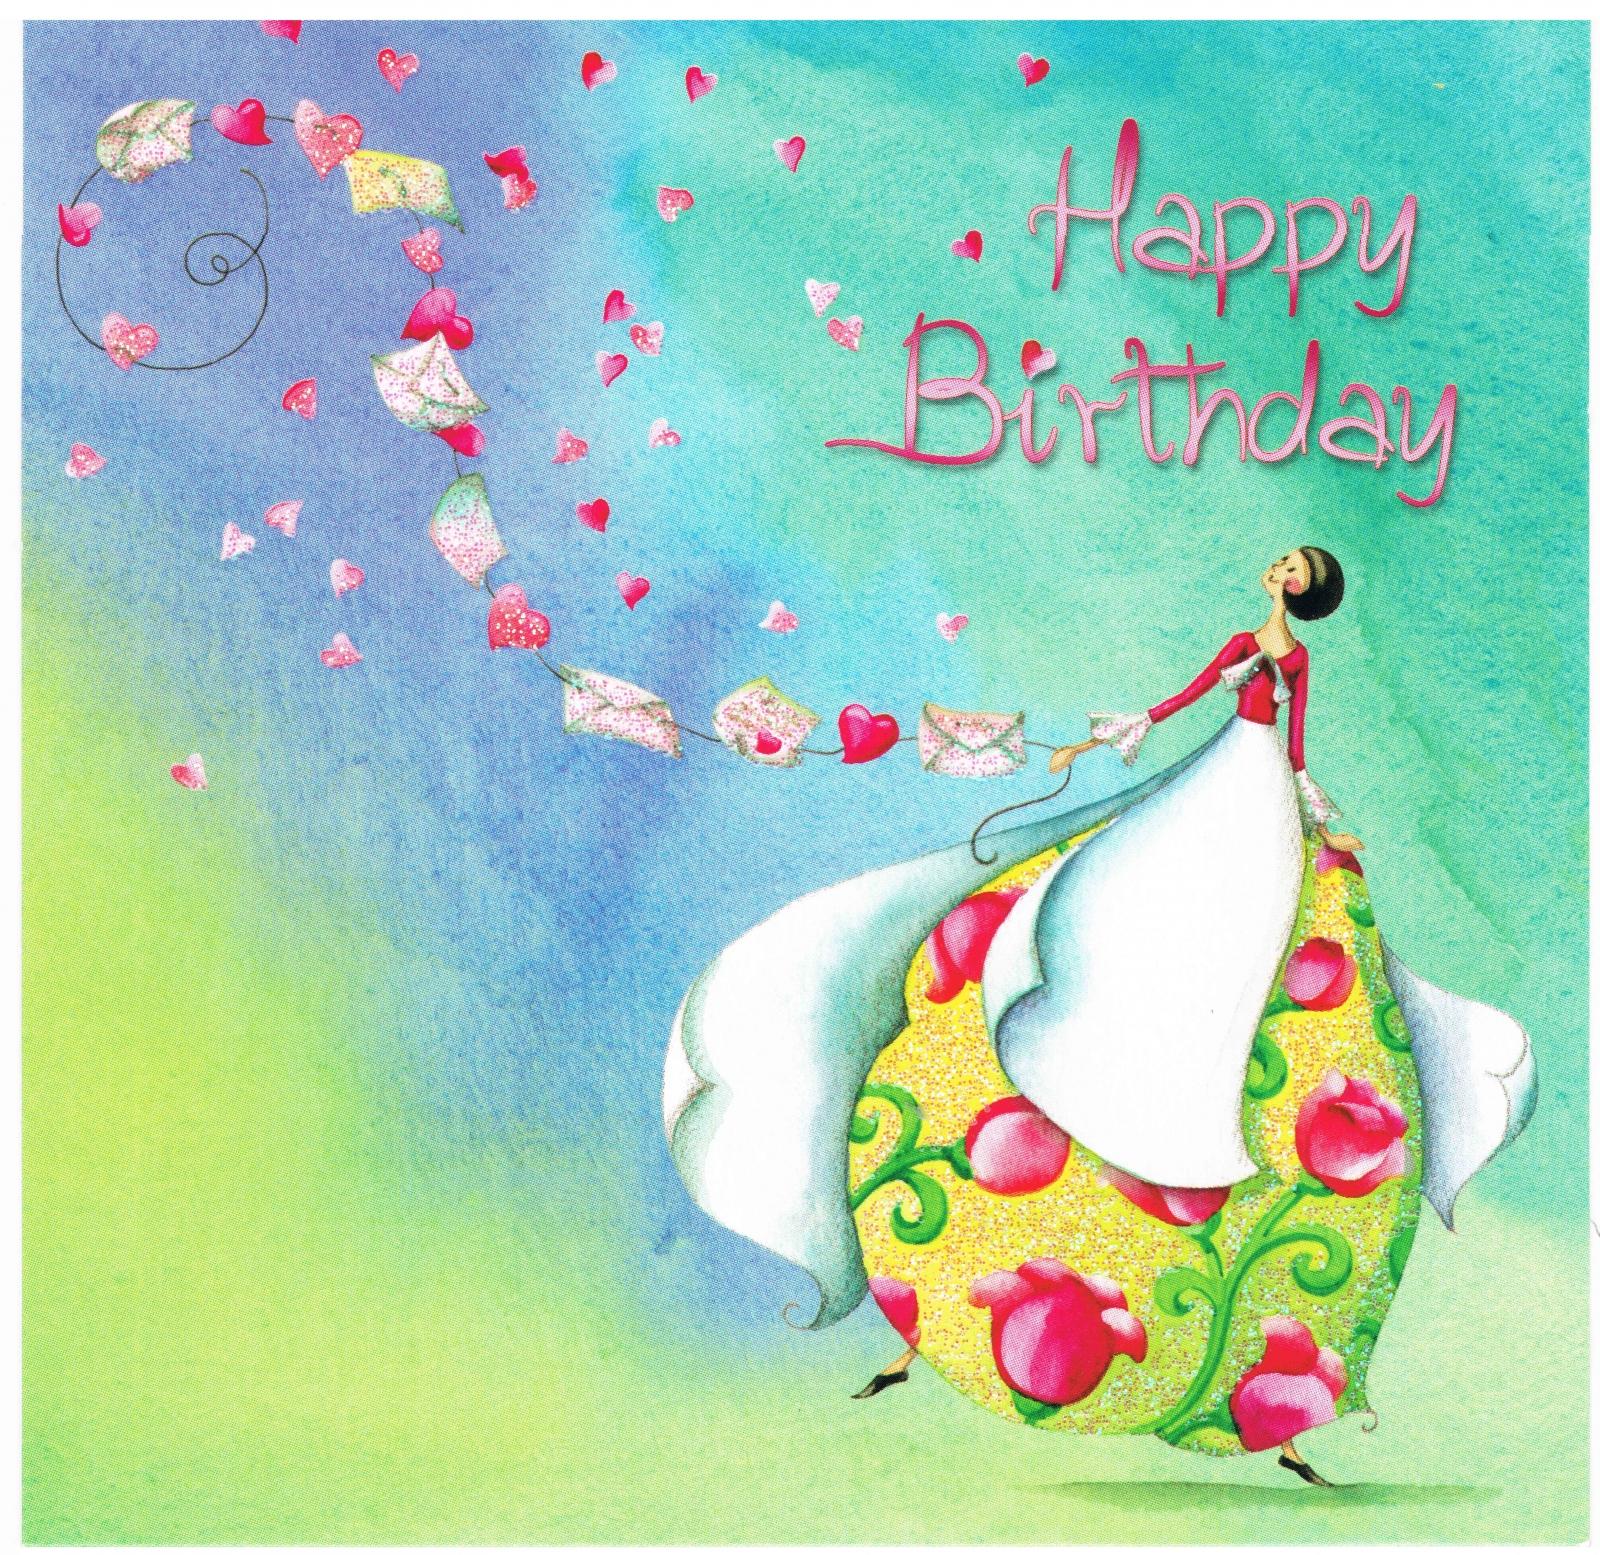 Joyeux Anniversaire Cartes Postales Cartes Postales Nina Shen